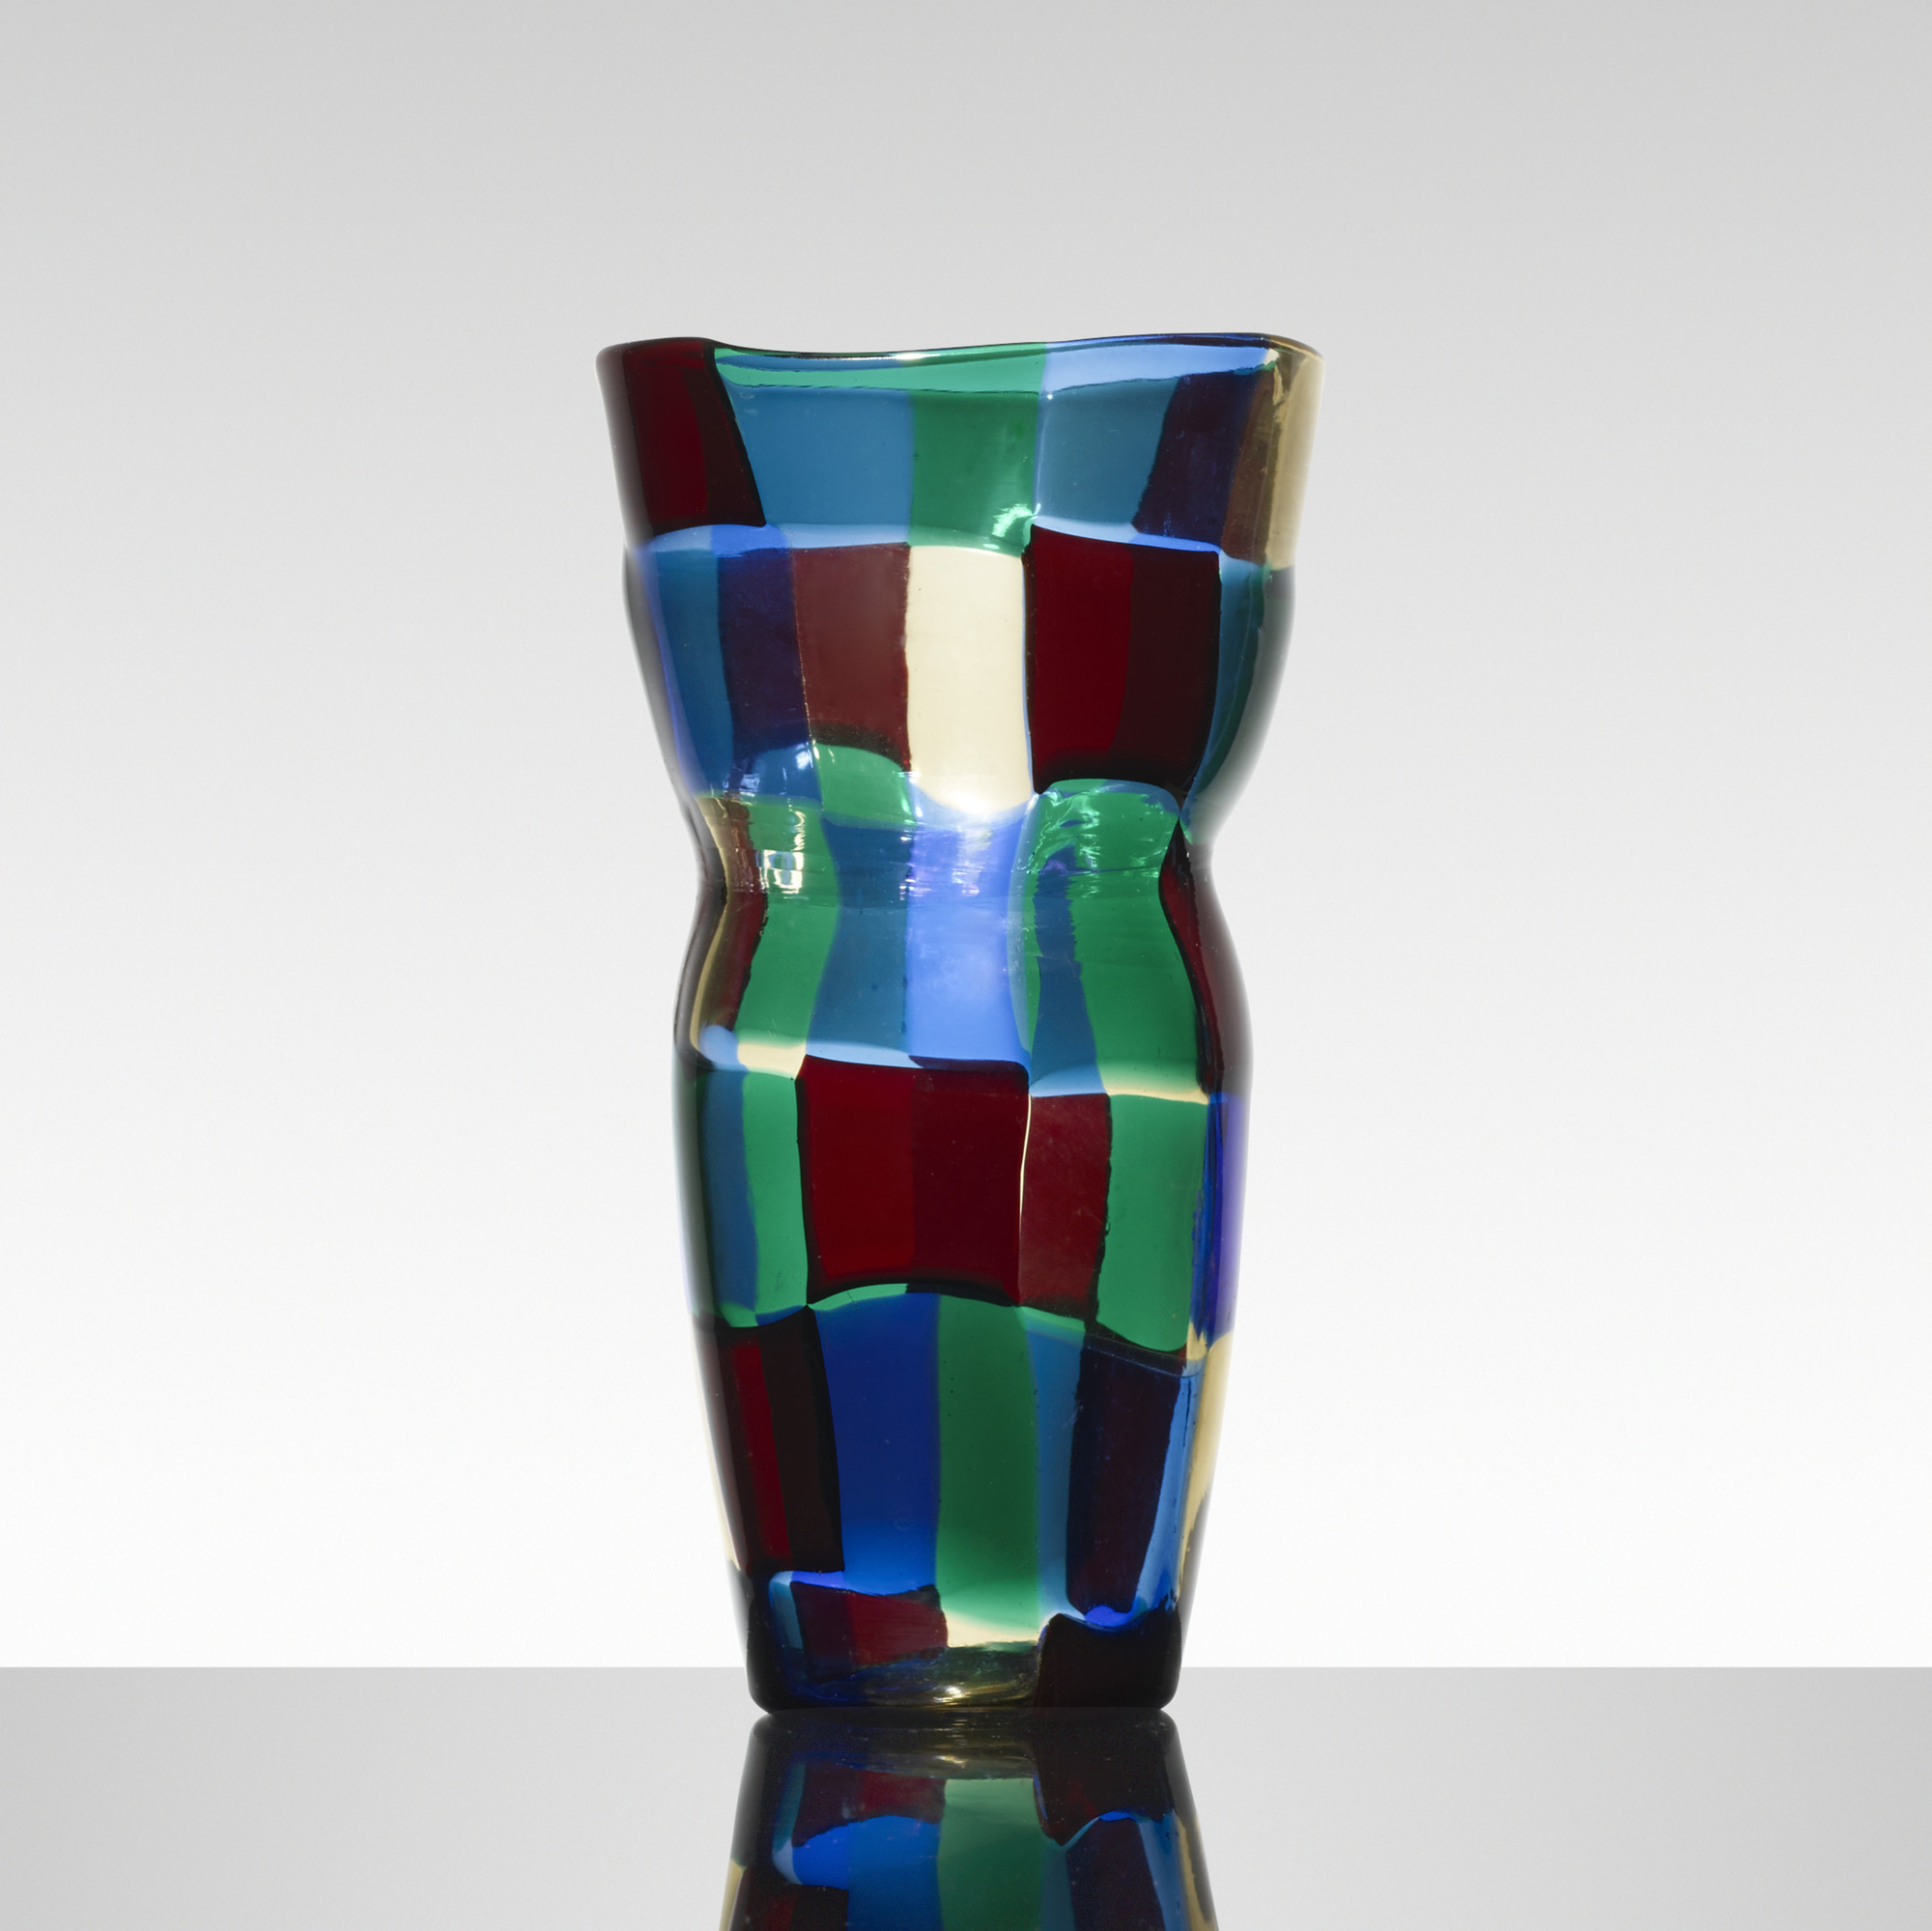 143: Fulvio Bianconi / Pezzato vase, model 4402 (1 of 2)